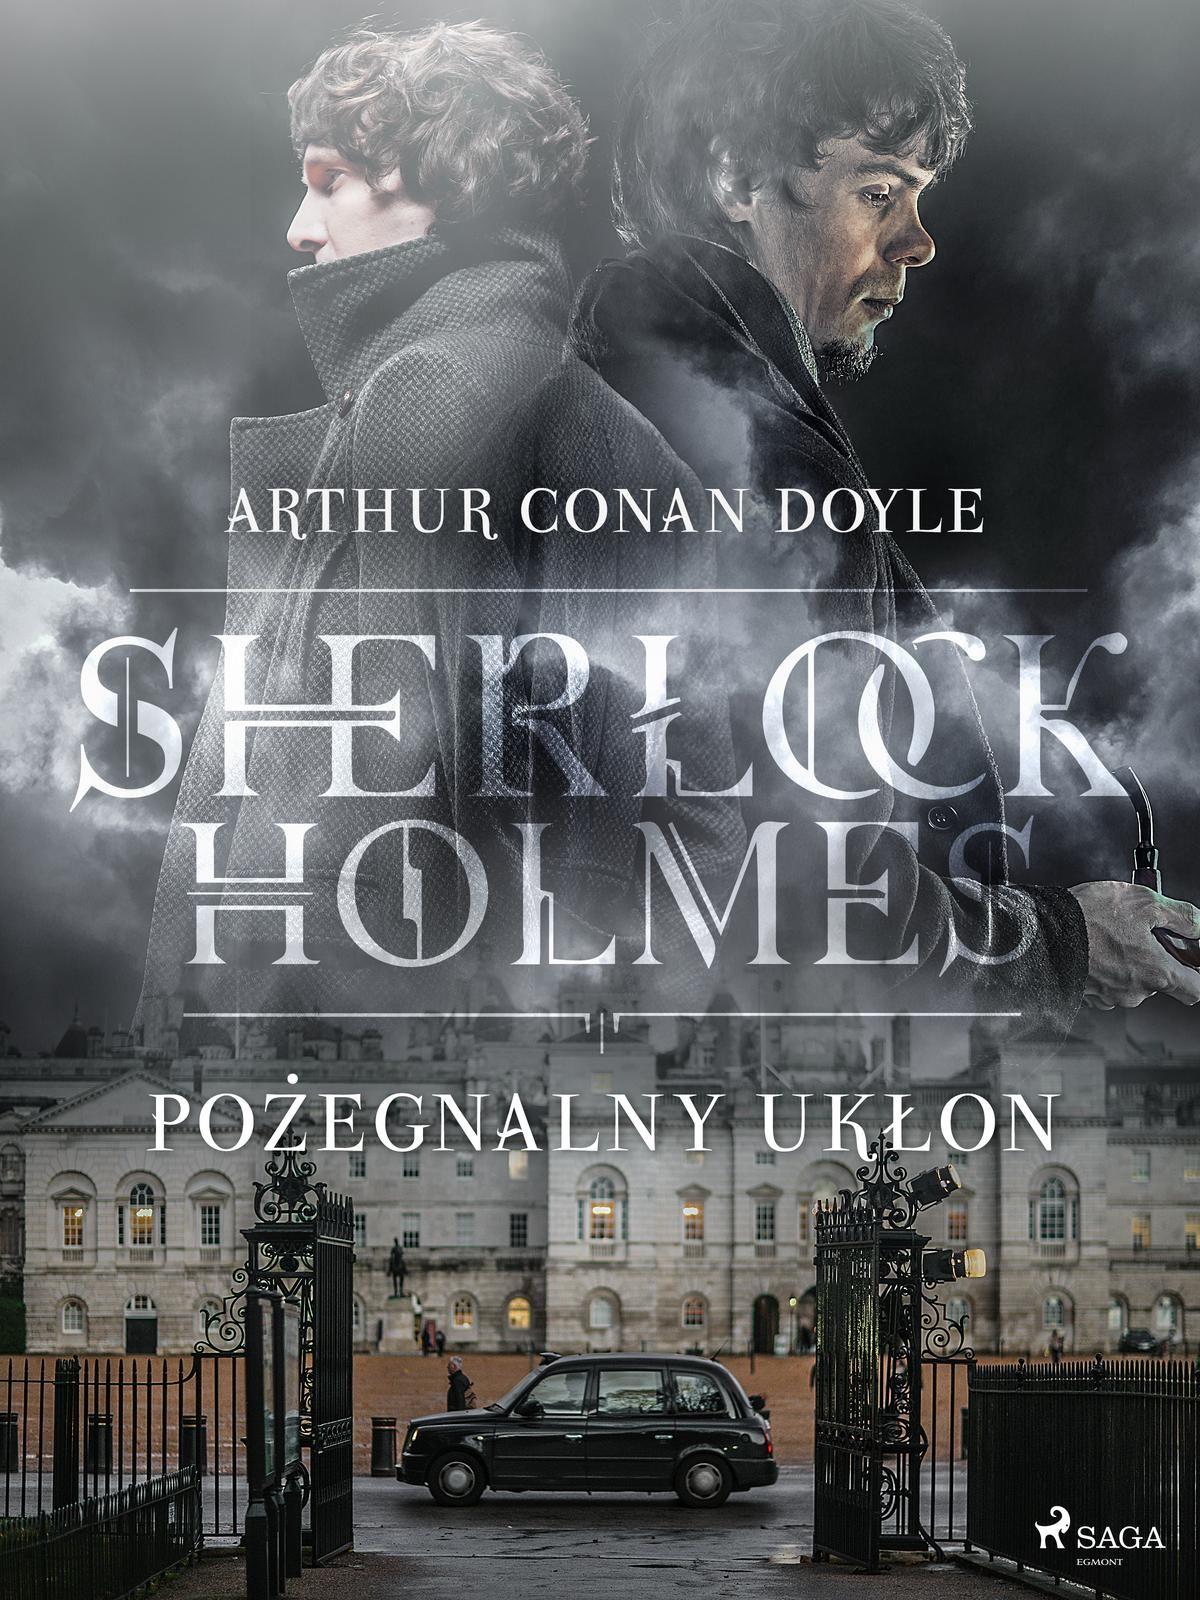 Pożegnalny ukłon - Arthur Conan Doyle - ebook